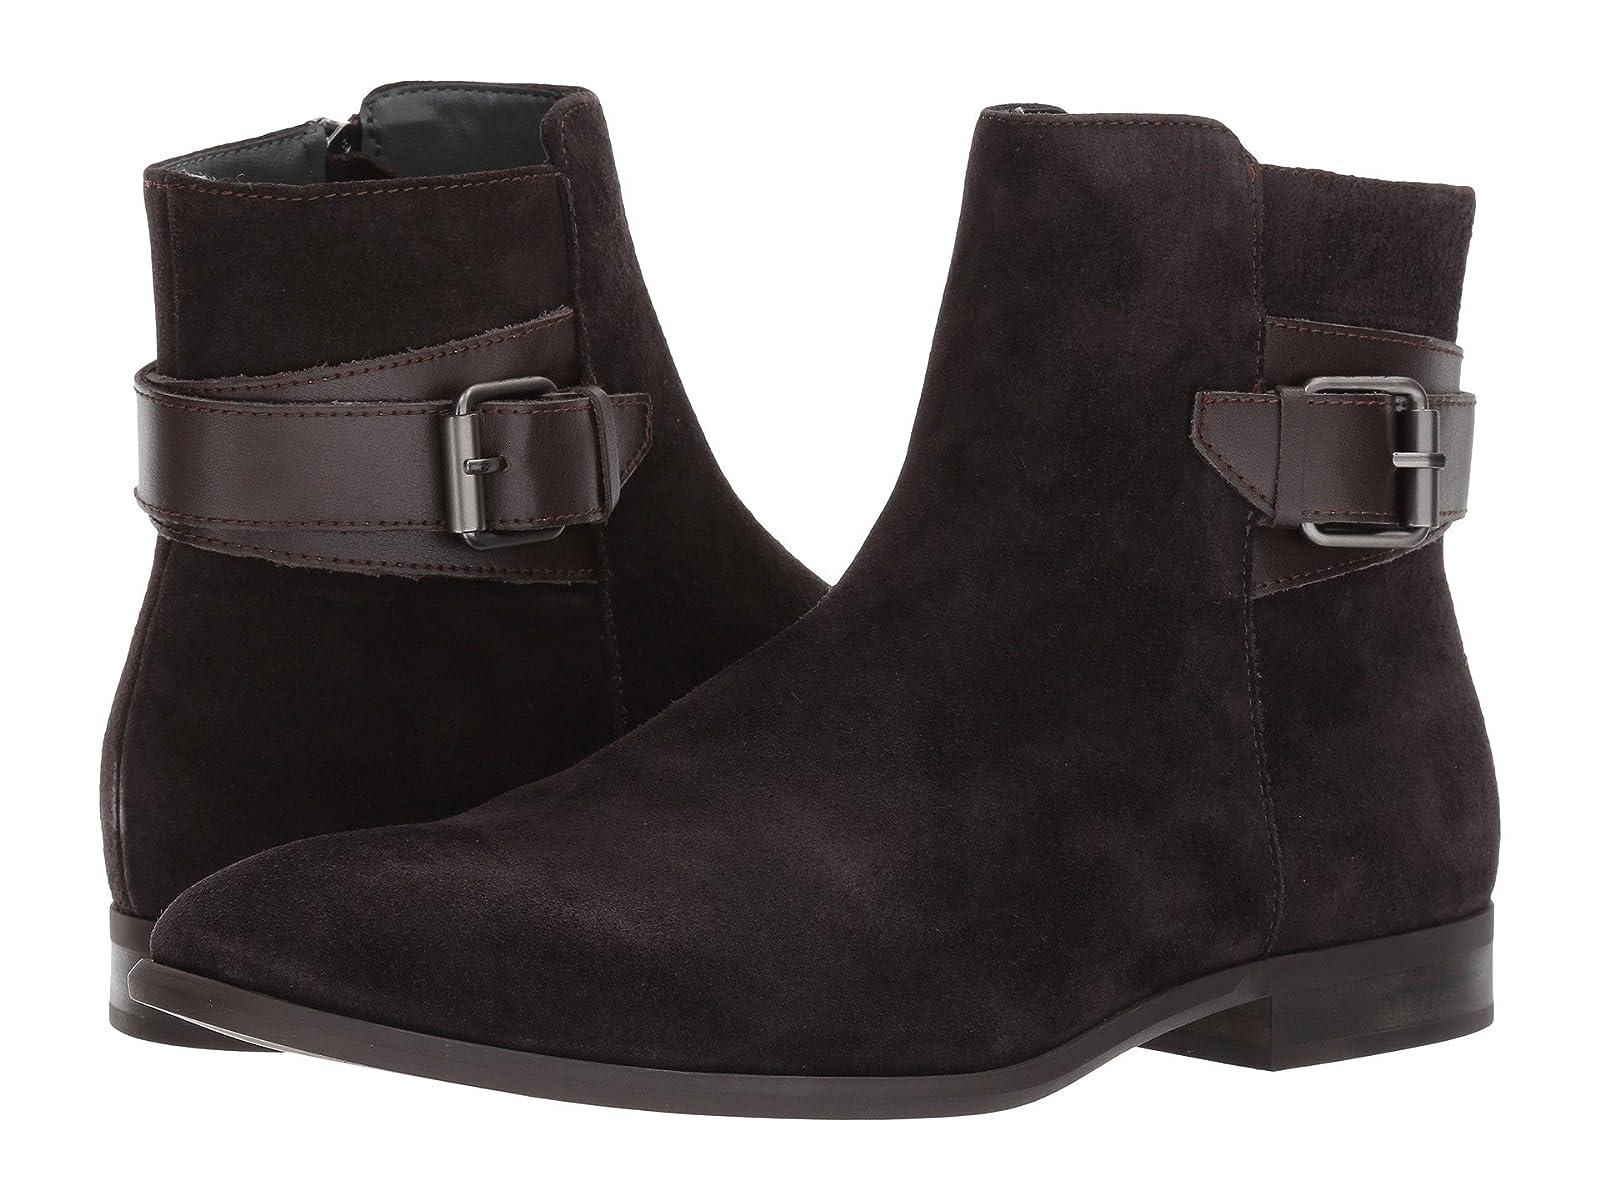 Calvin Klein LorenzoCheap and distinctive eye-catching shoes